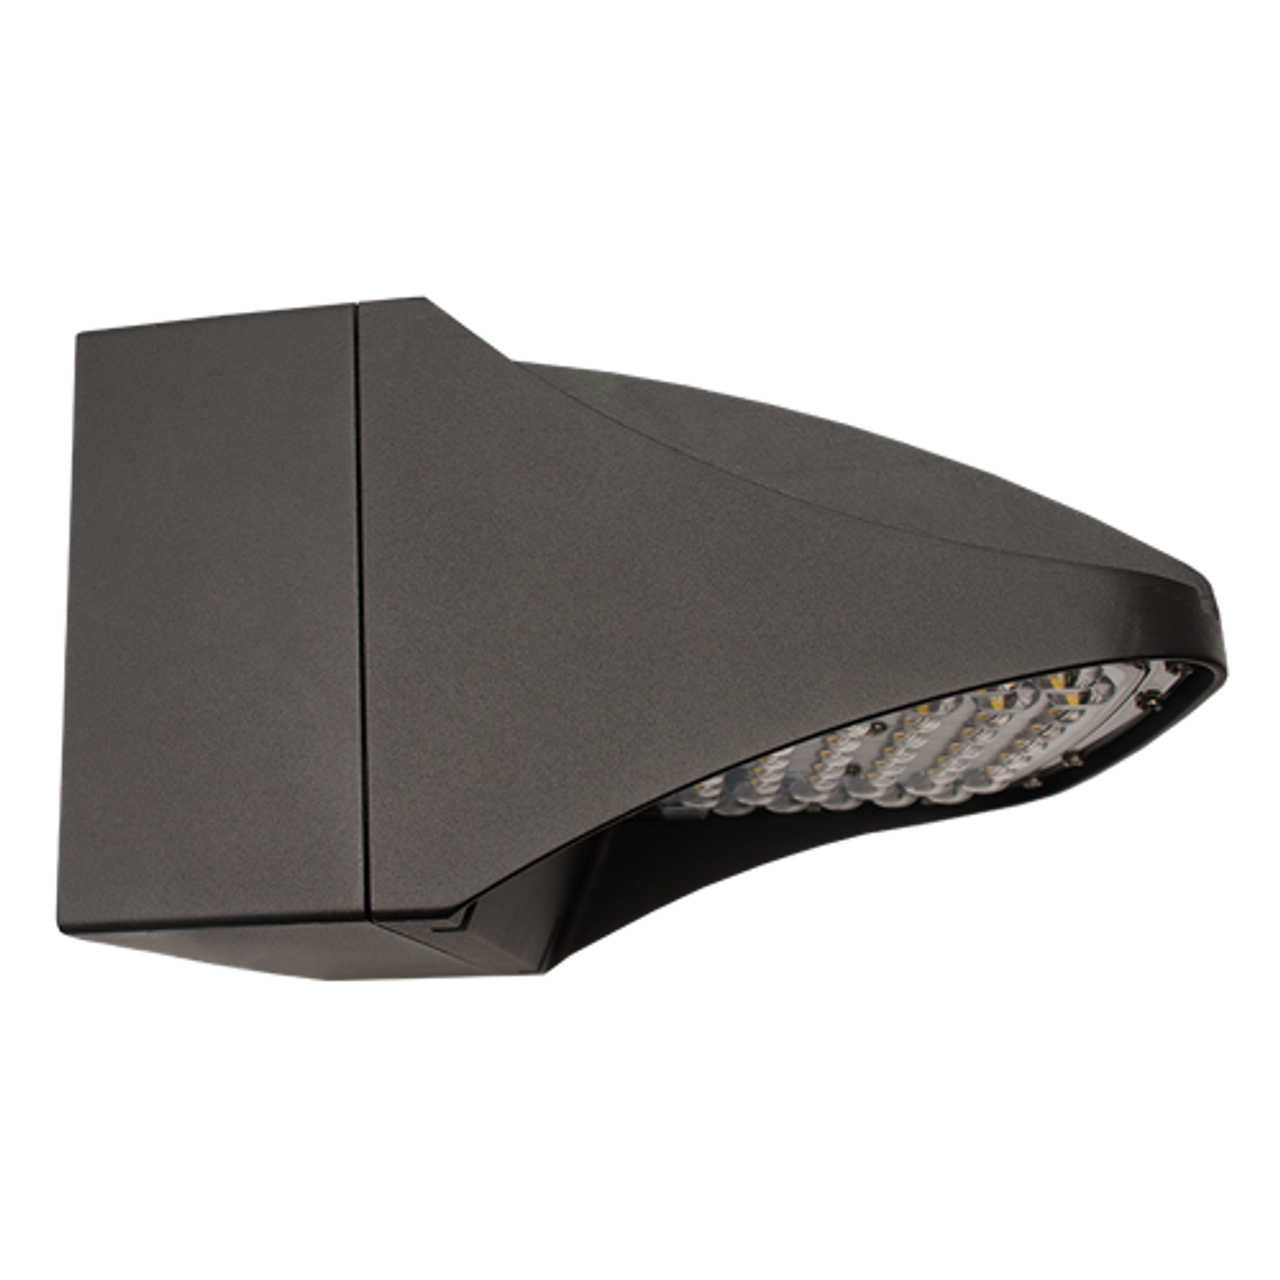 Full Cutoff Wallpack 81 Watt PowerPack with Battery Back-up